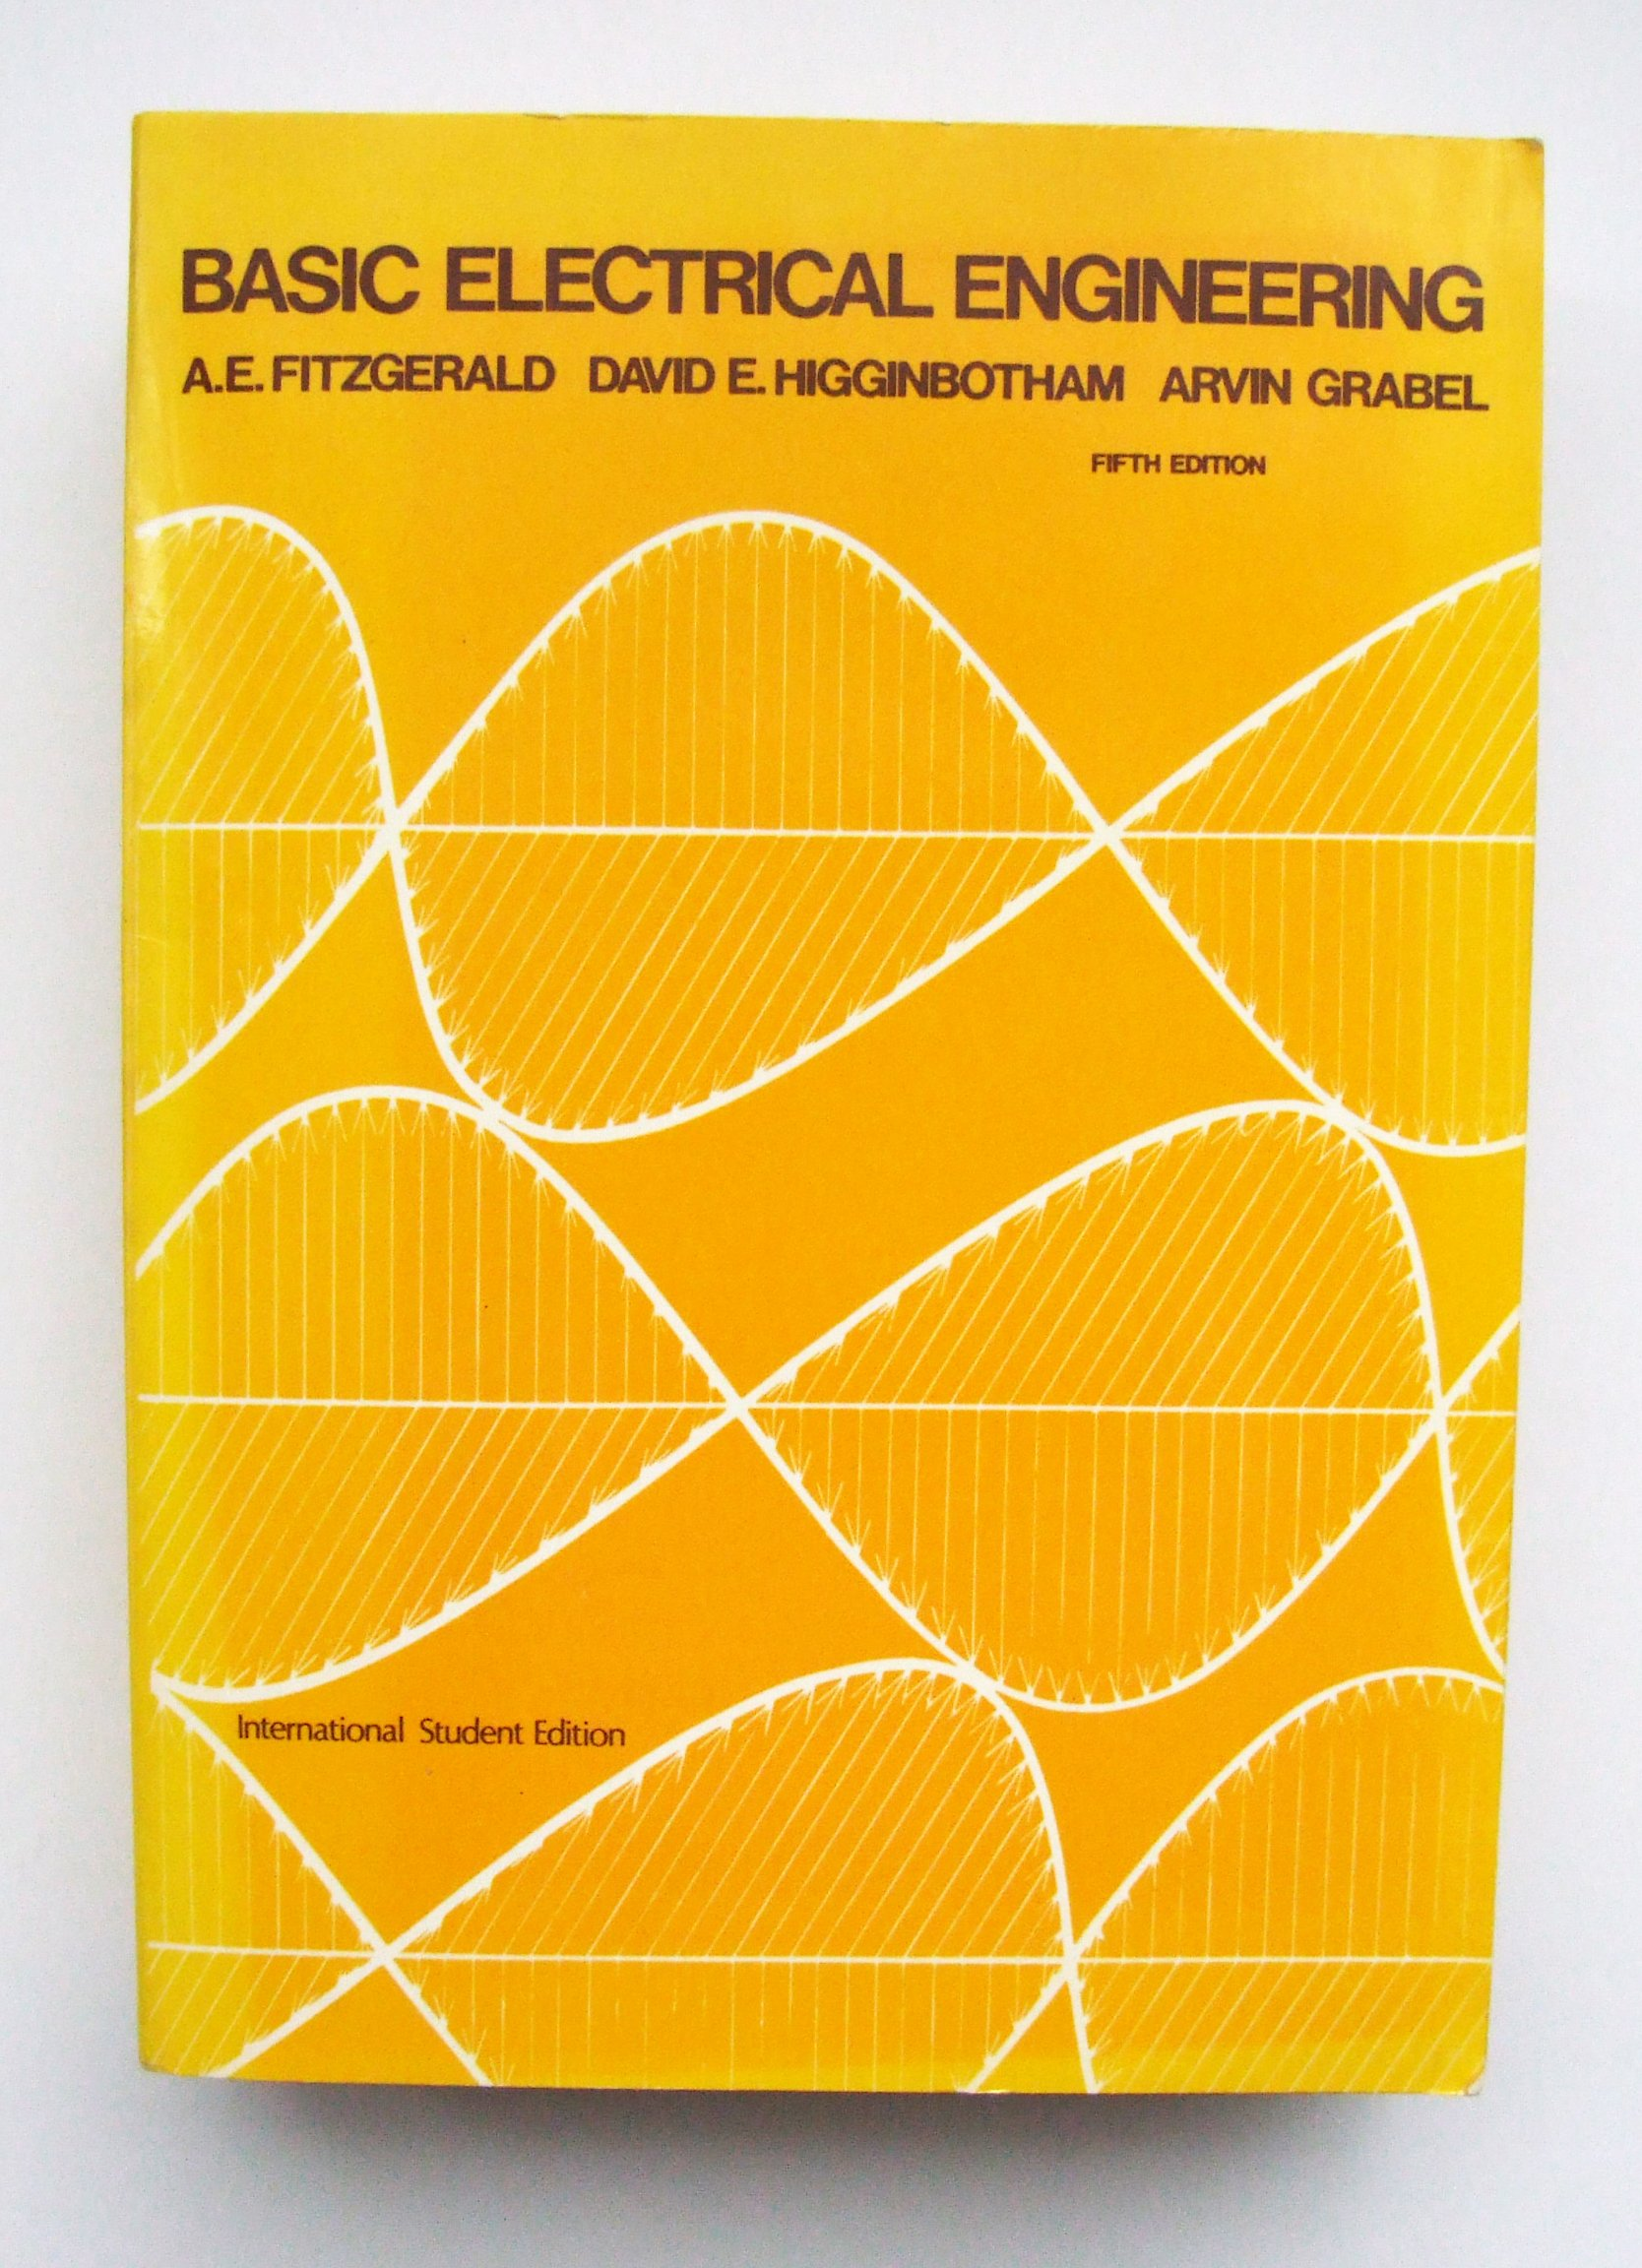 Basic Electrical Engineering: A.E. Fitzgerald, David E Higginbotham ...